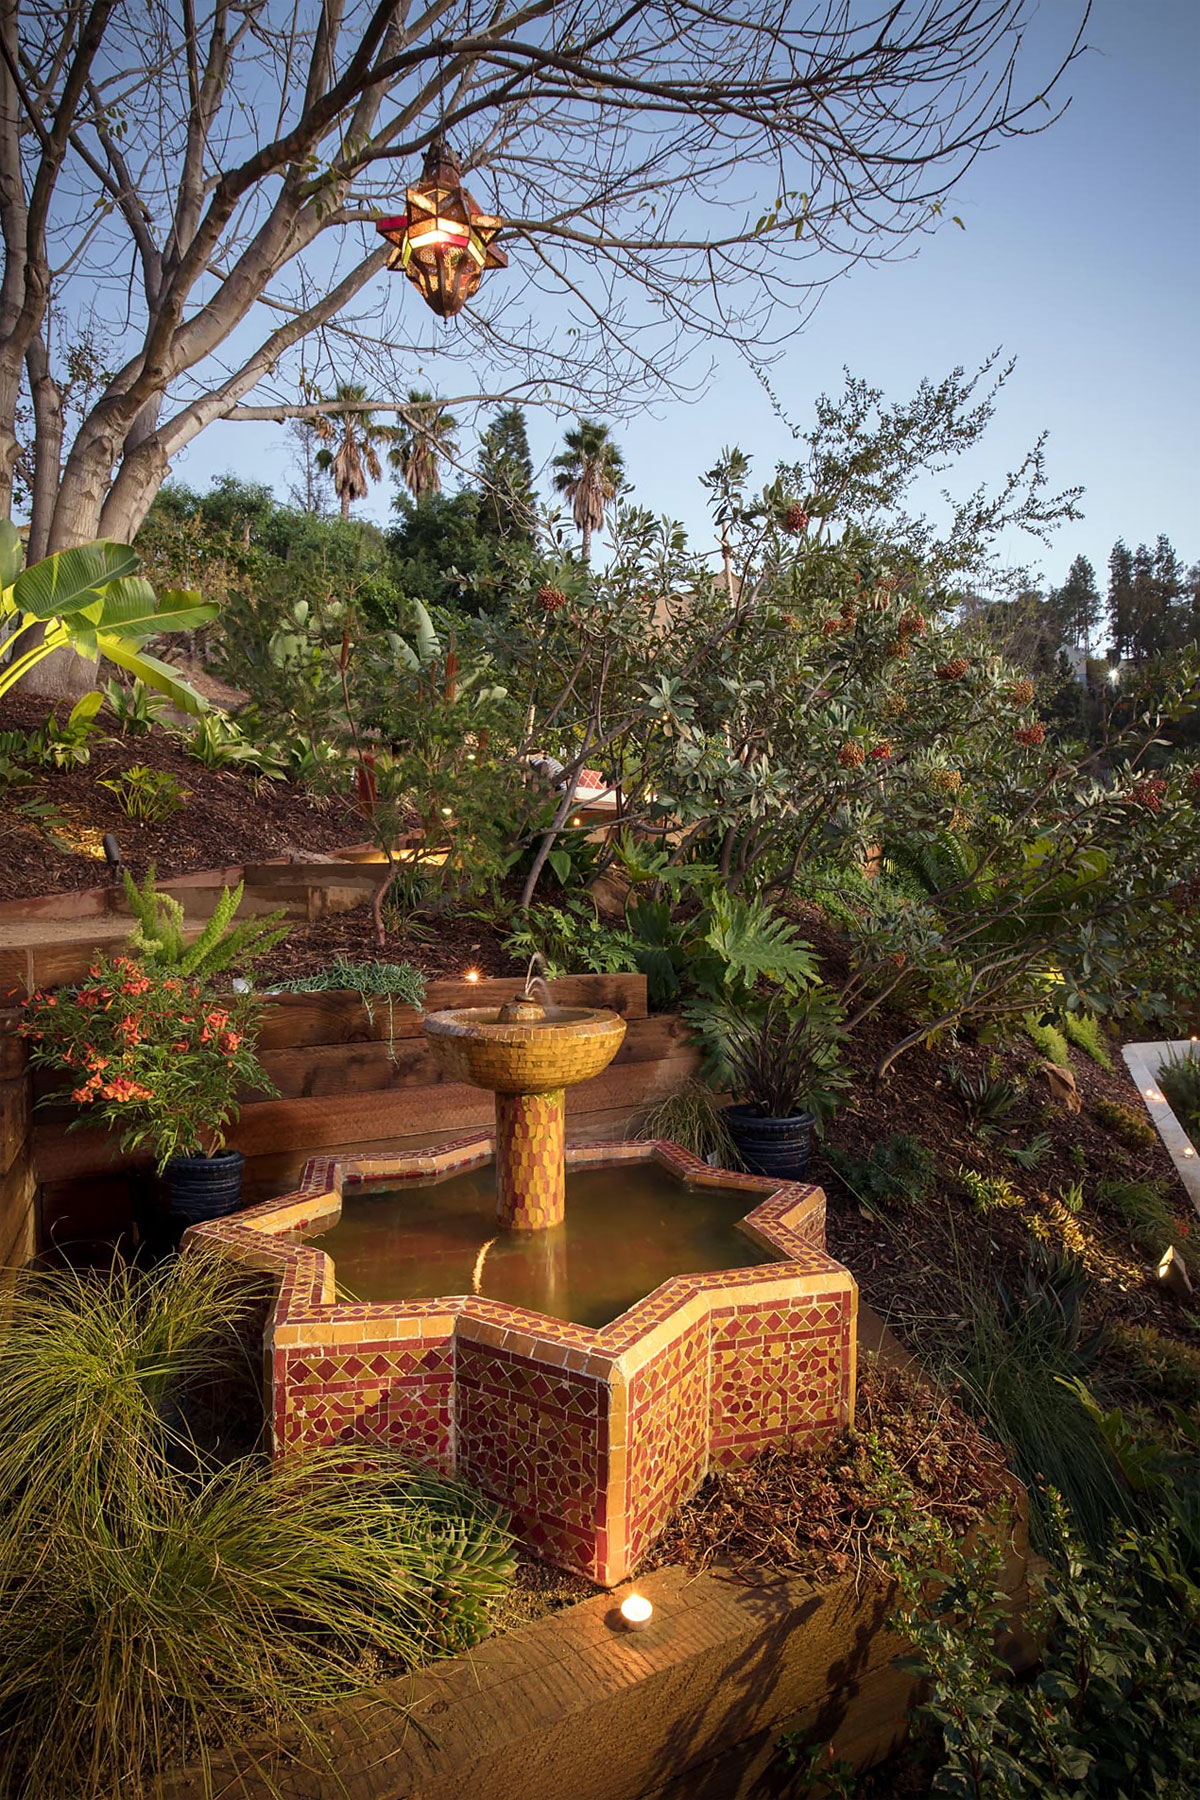 Elements: Garden Art | Horticultural Accents - Landscape Ornaments